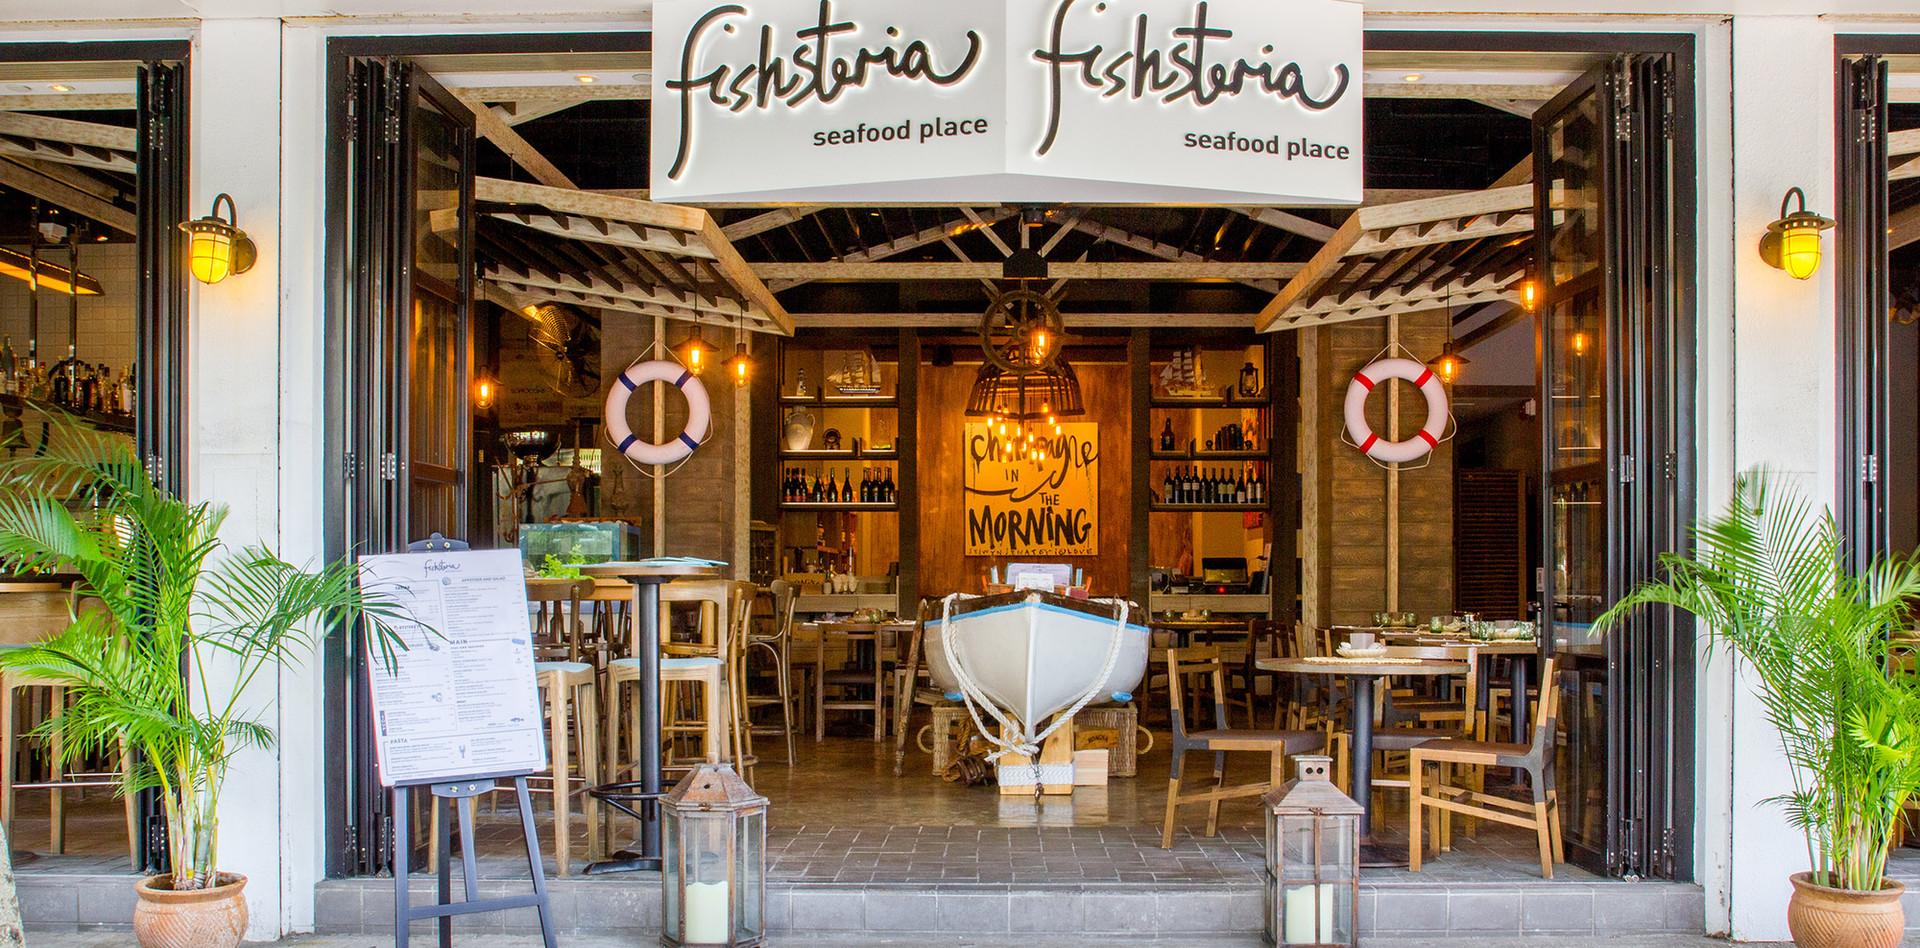 Fishsteria Seafood Place